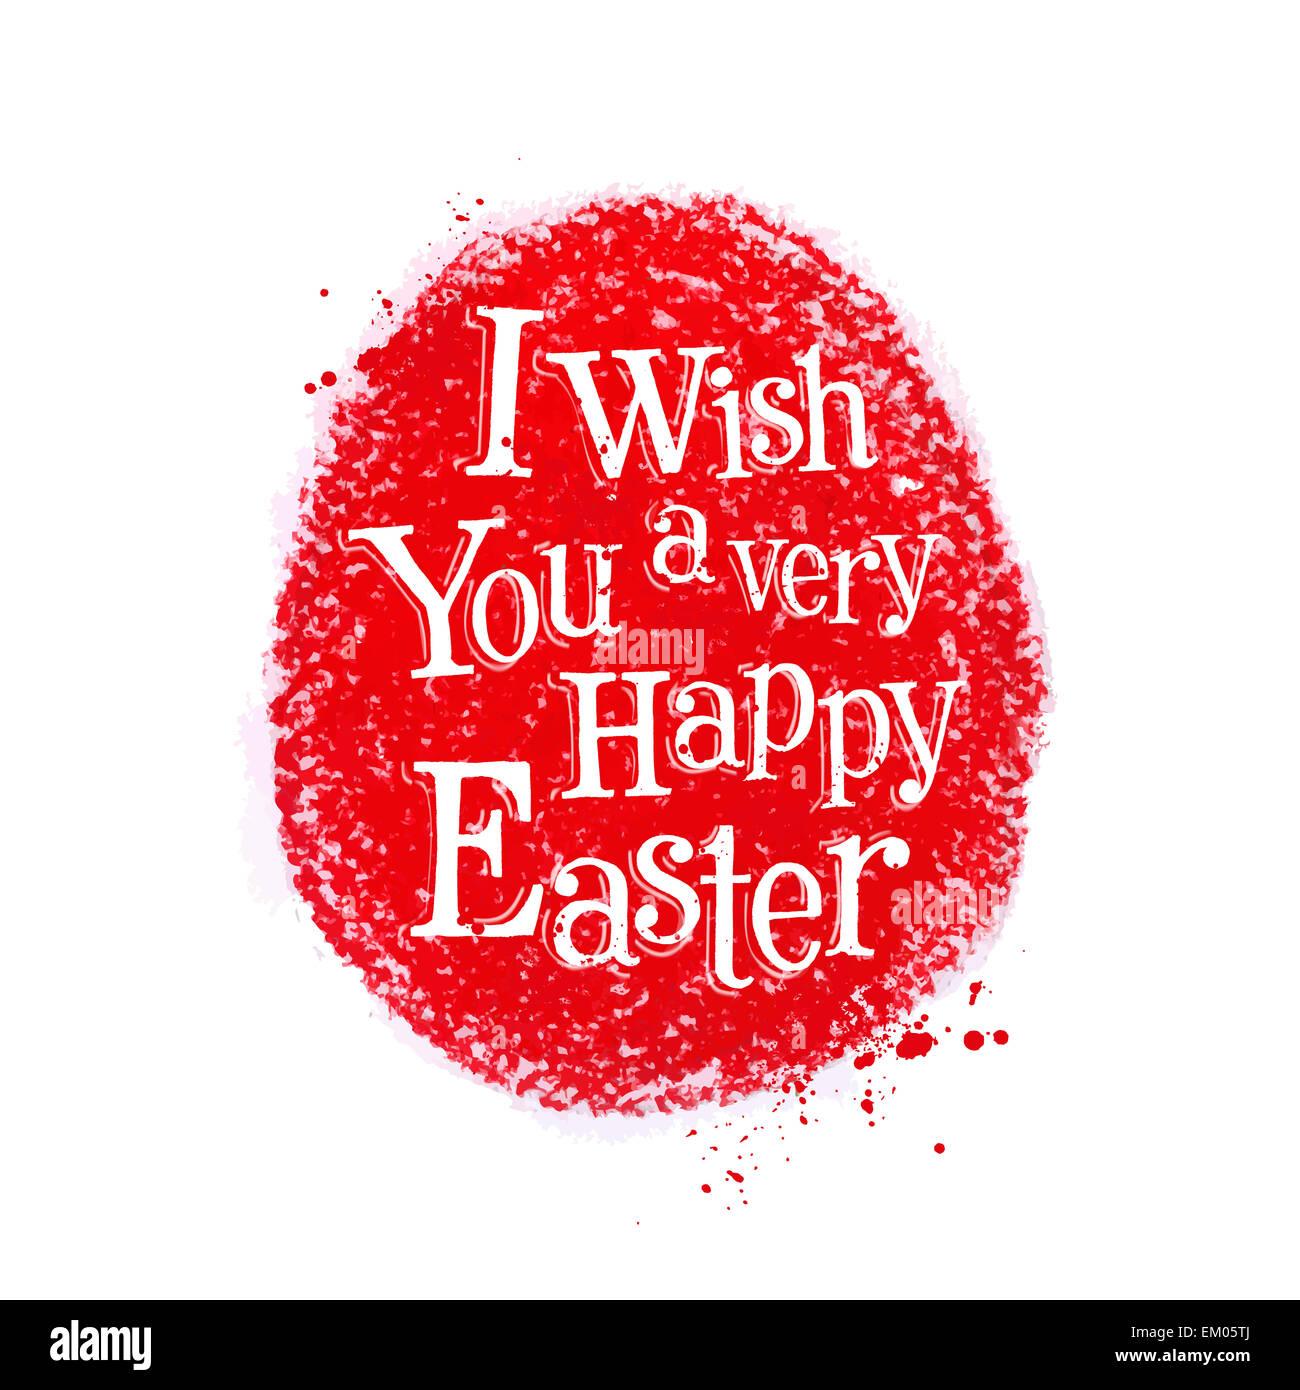 Ostern-Vektor-Logo-Design-Vorlage. Ei oder Urlaub-Symbol. Stockbild